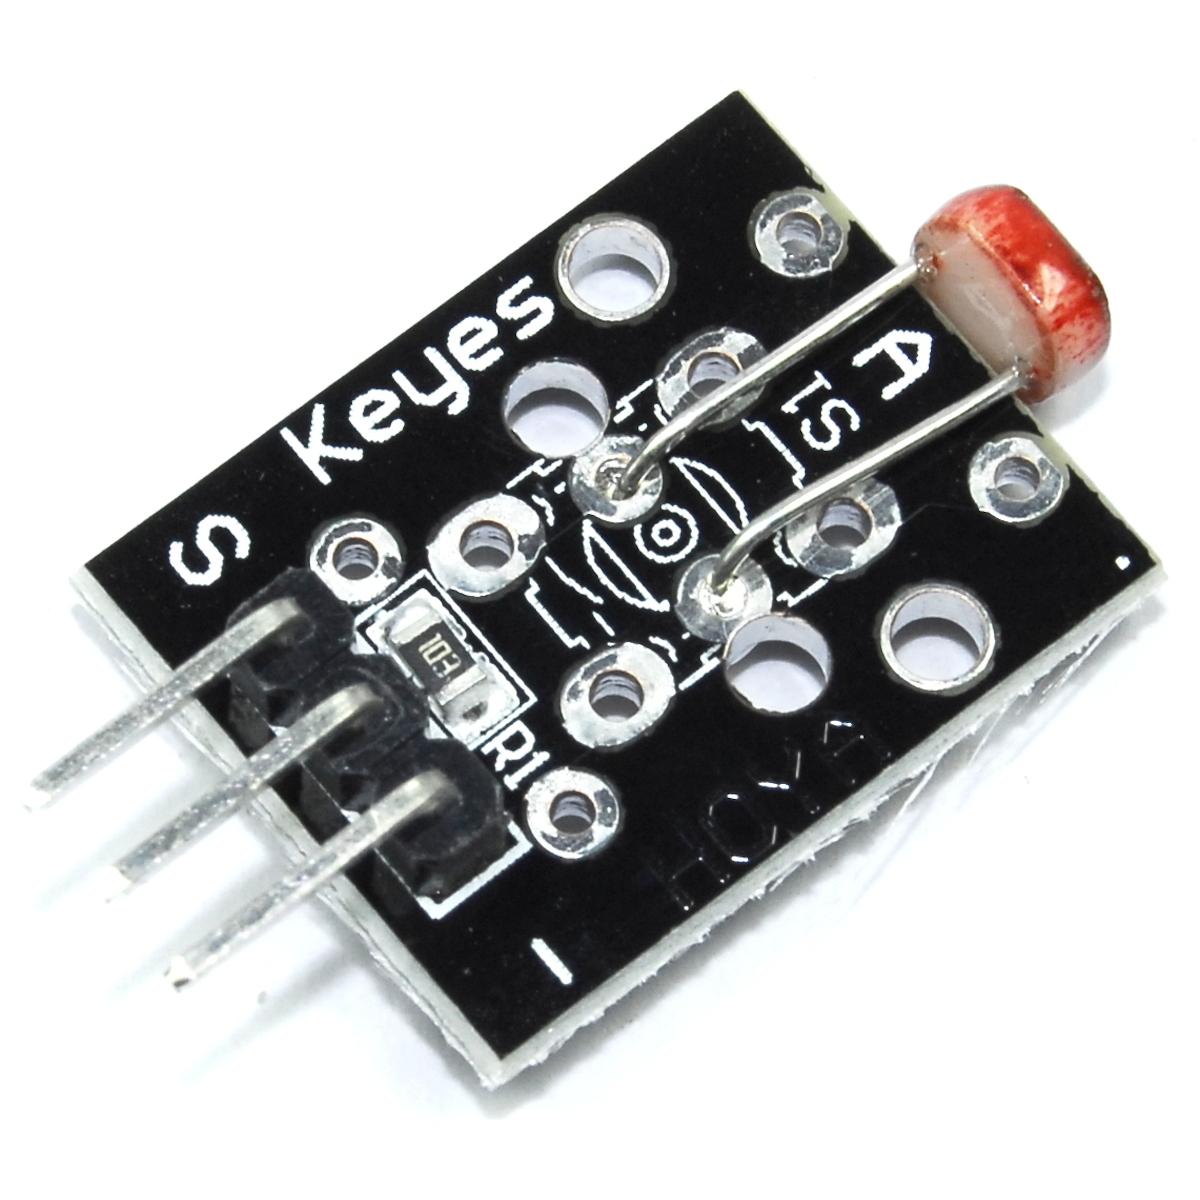 Keyes Analog LDR Sensor Module KY-018 Light Dependant Photo Ardu ...